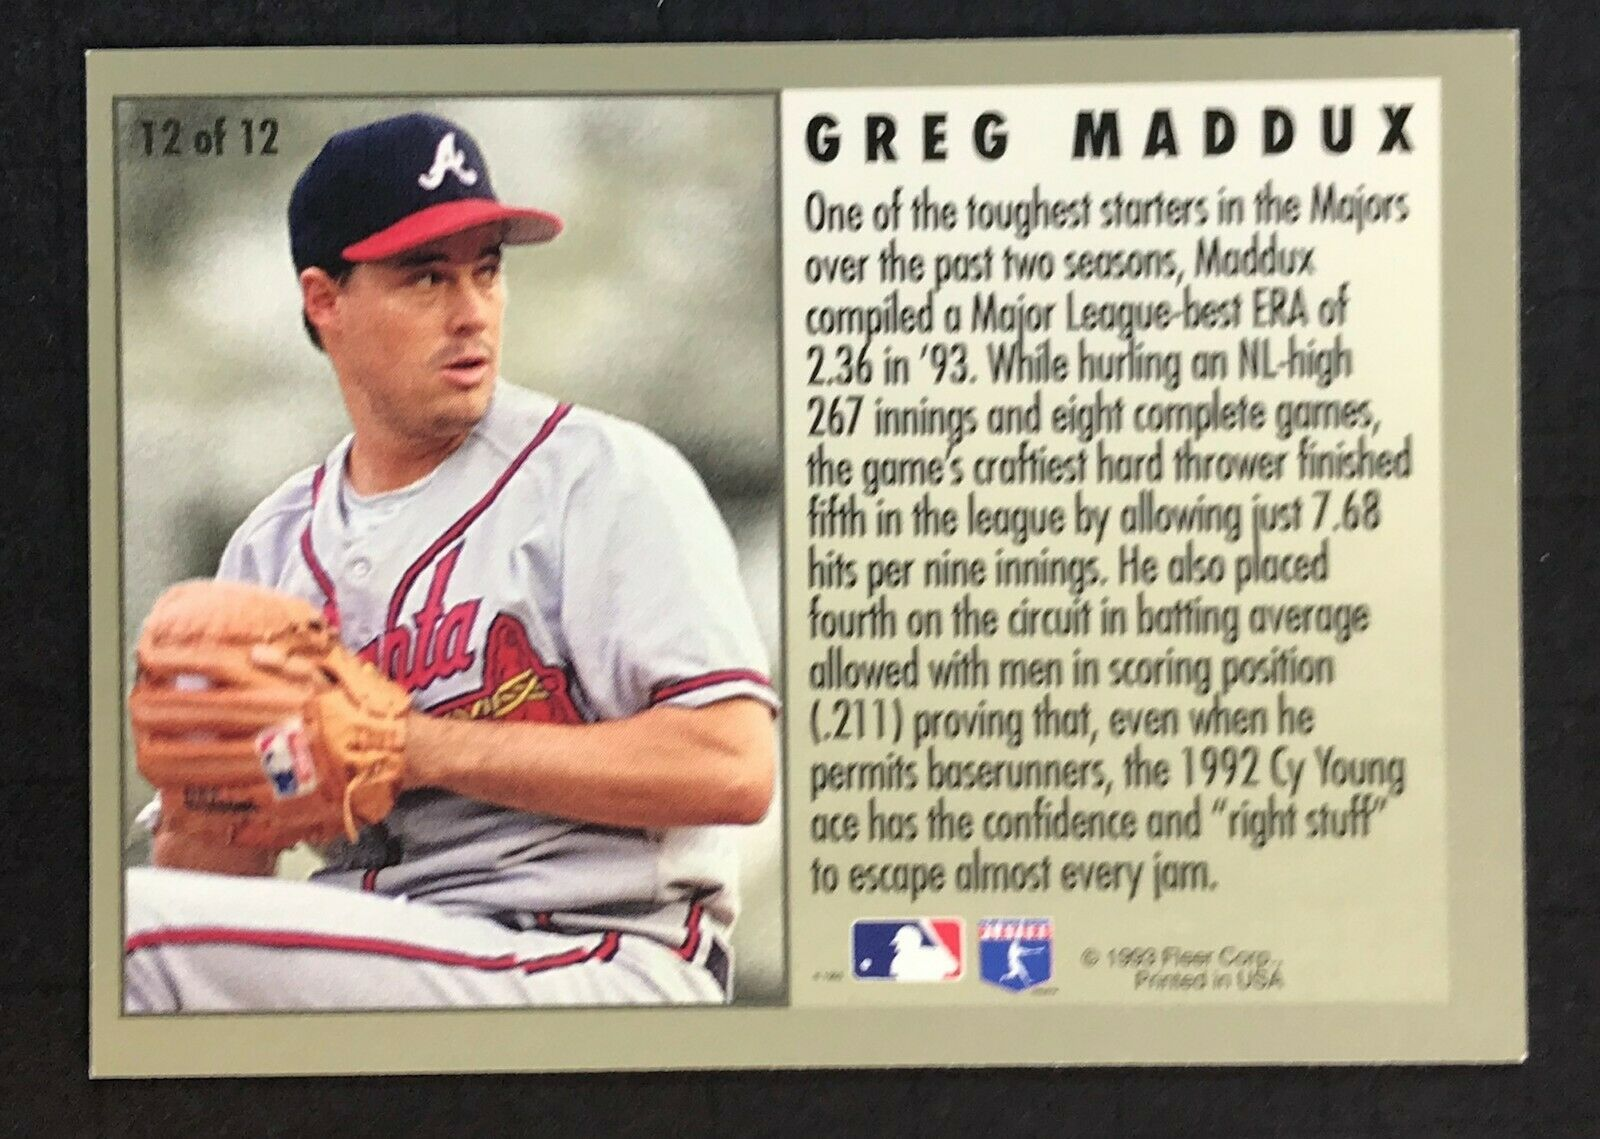 1994 Fleer League Leader Greg Maddux Card #12 of 12